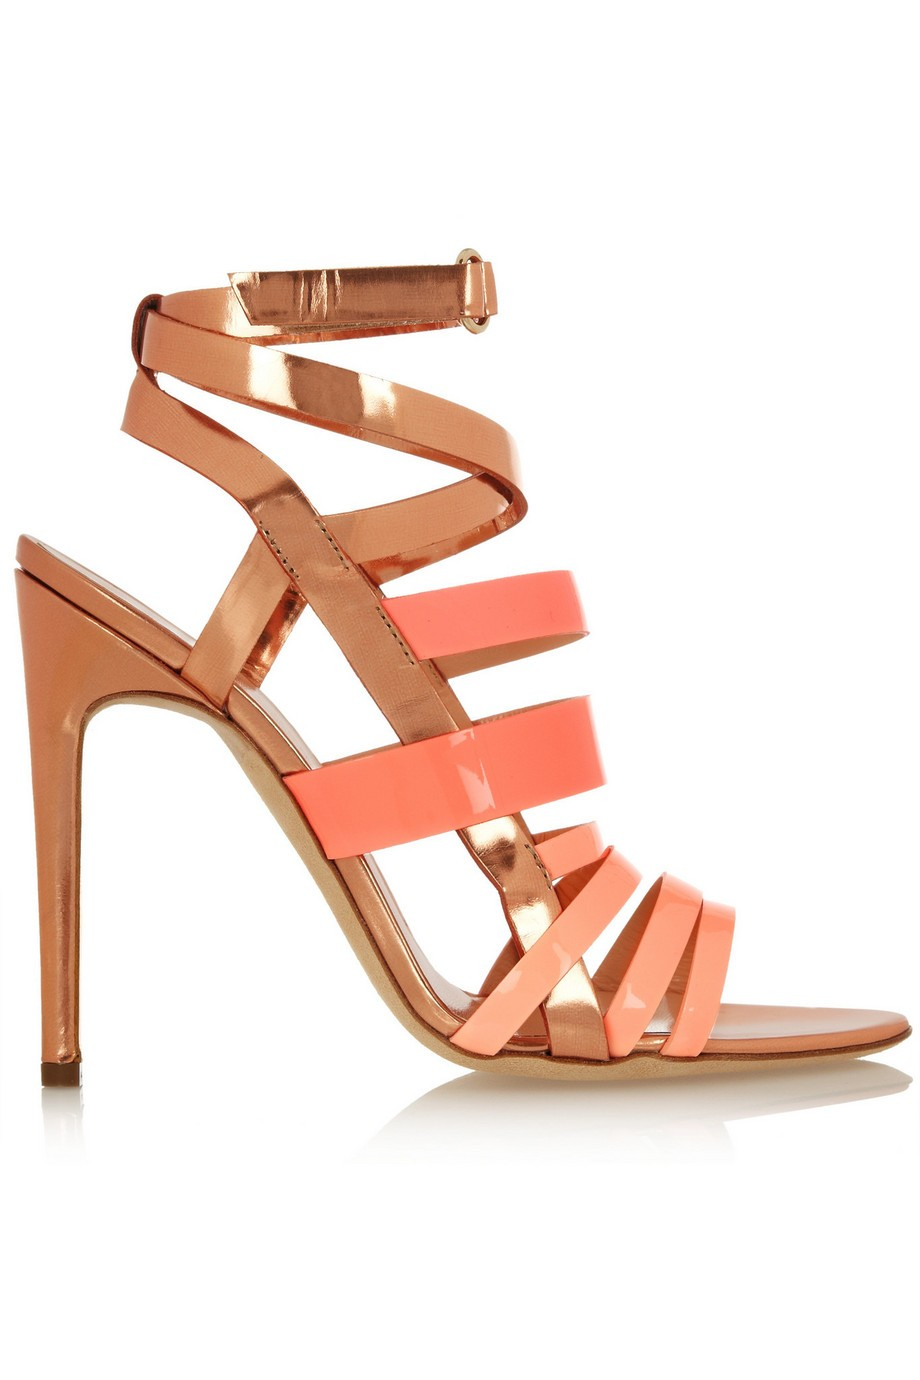 Rupert Sanderson Tallyho metallic leather sandals